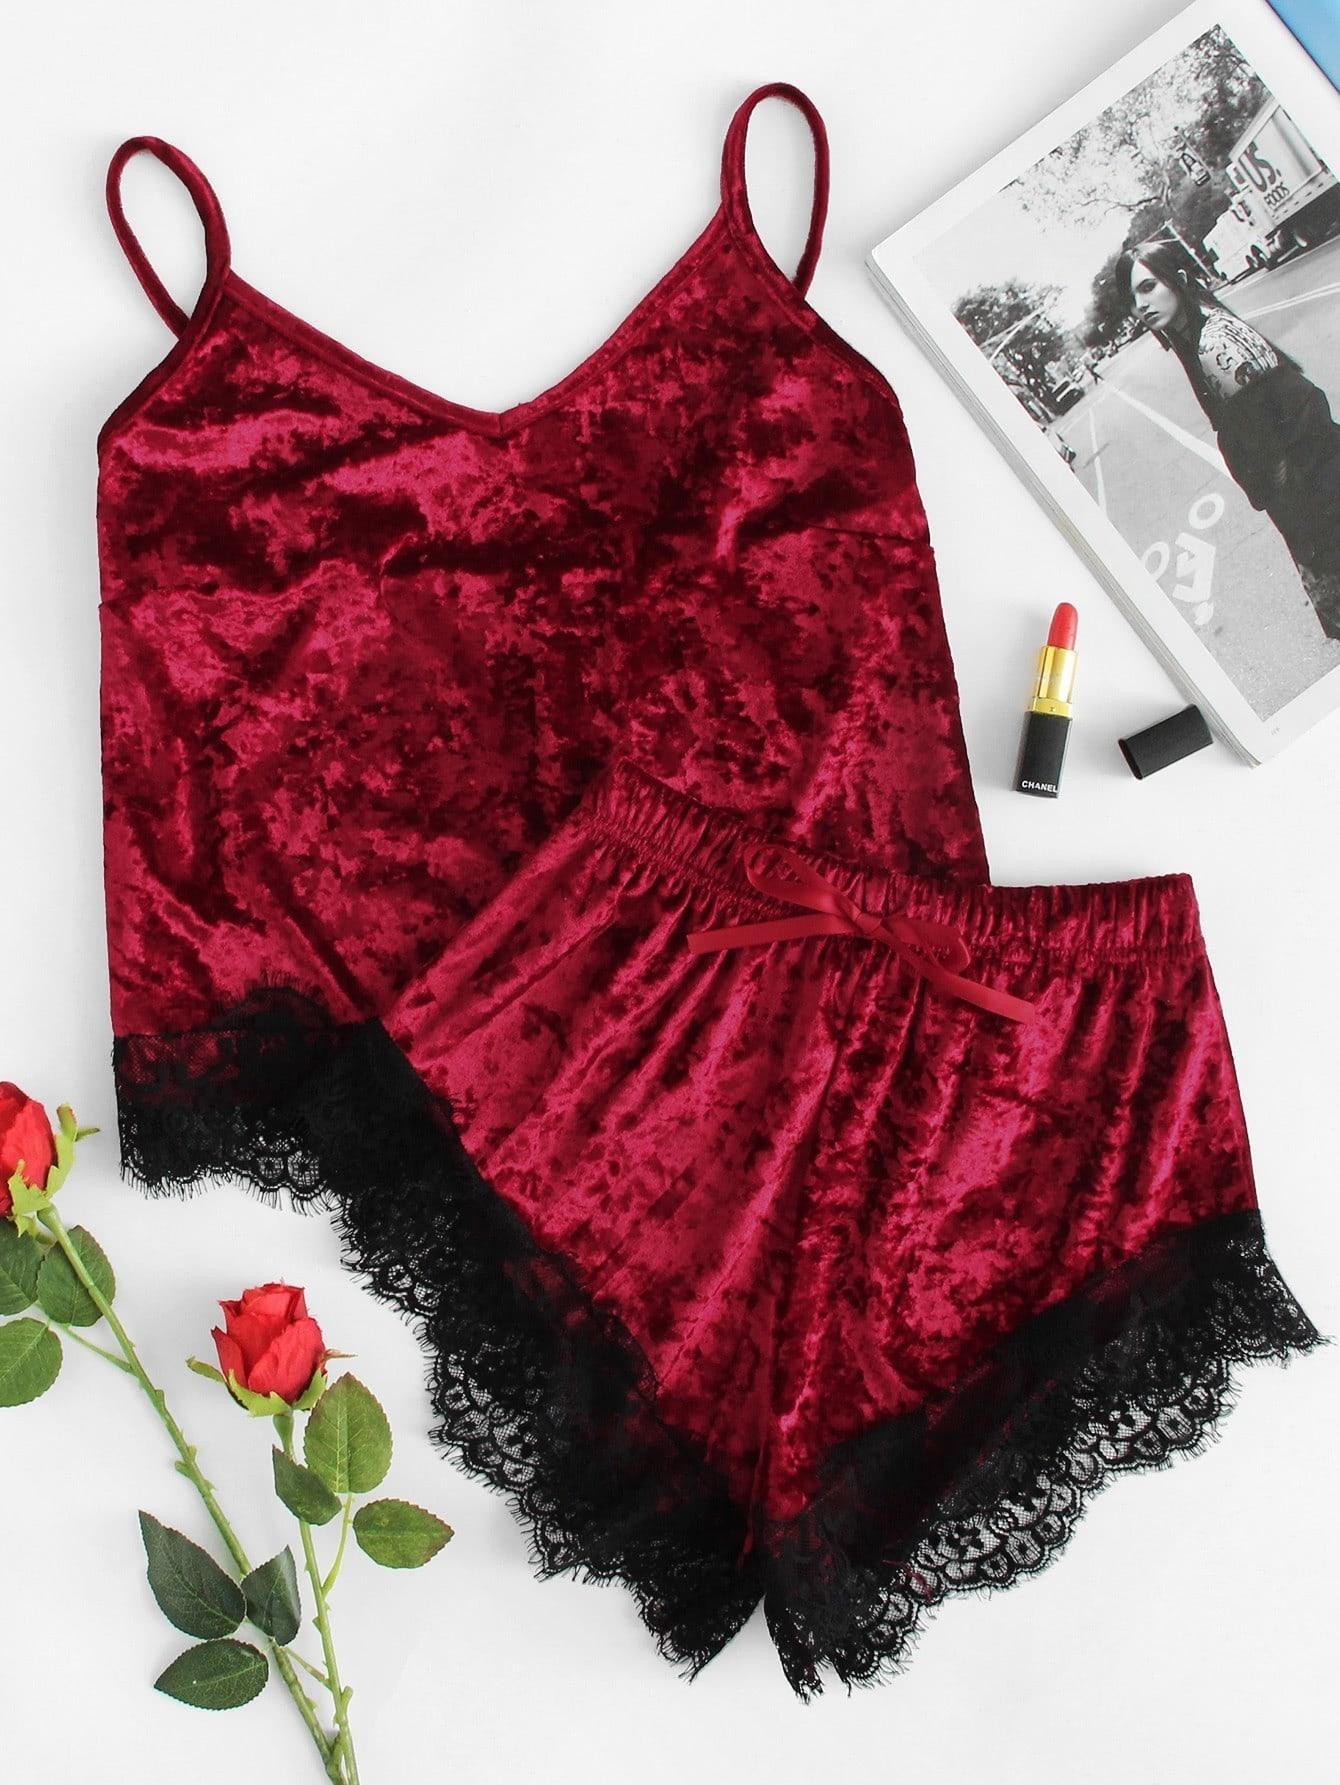 Contrast Eyelash Lace Crushed Velvet Cami PJ Set crushed velvet top and shorts set